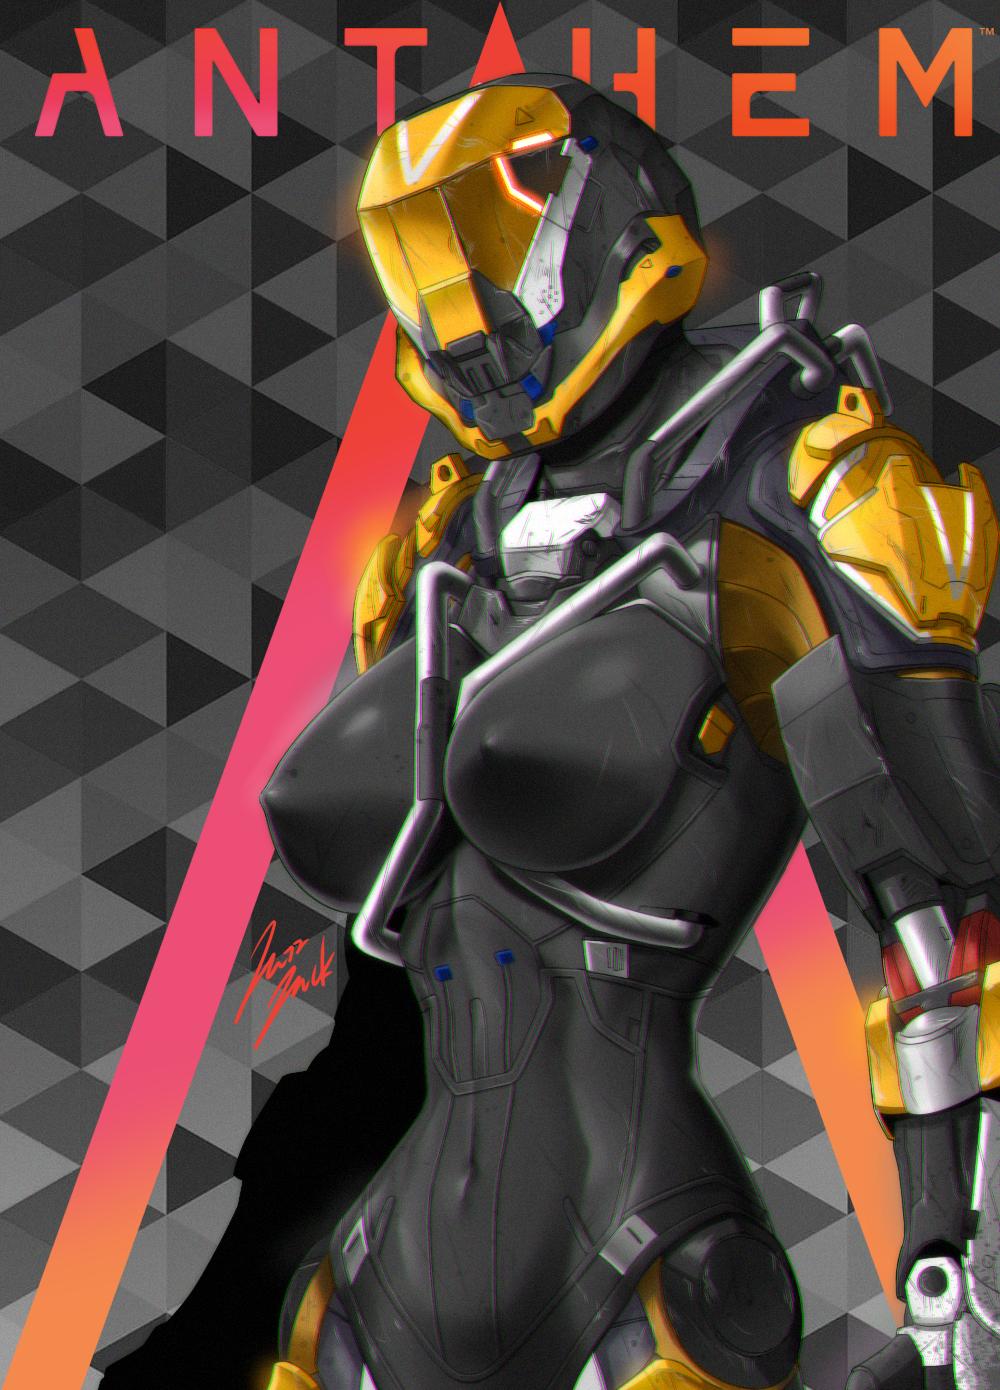 Anthem Ranger Javelin By Jazzjack Kht On Deviantart